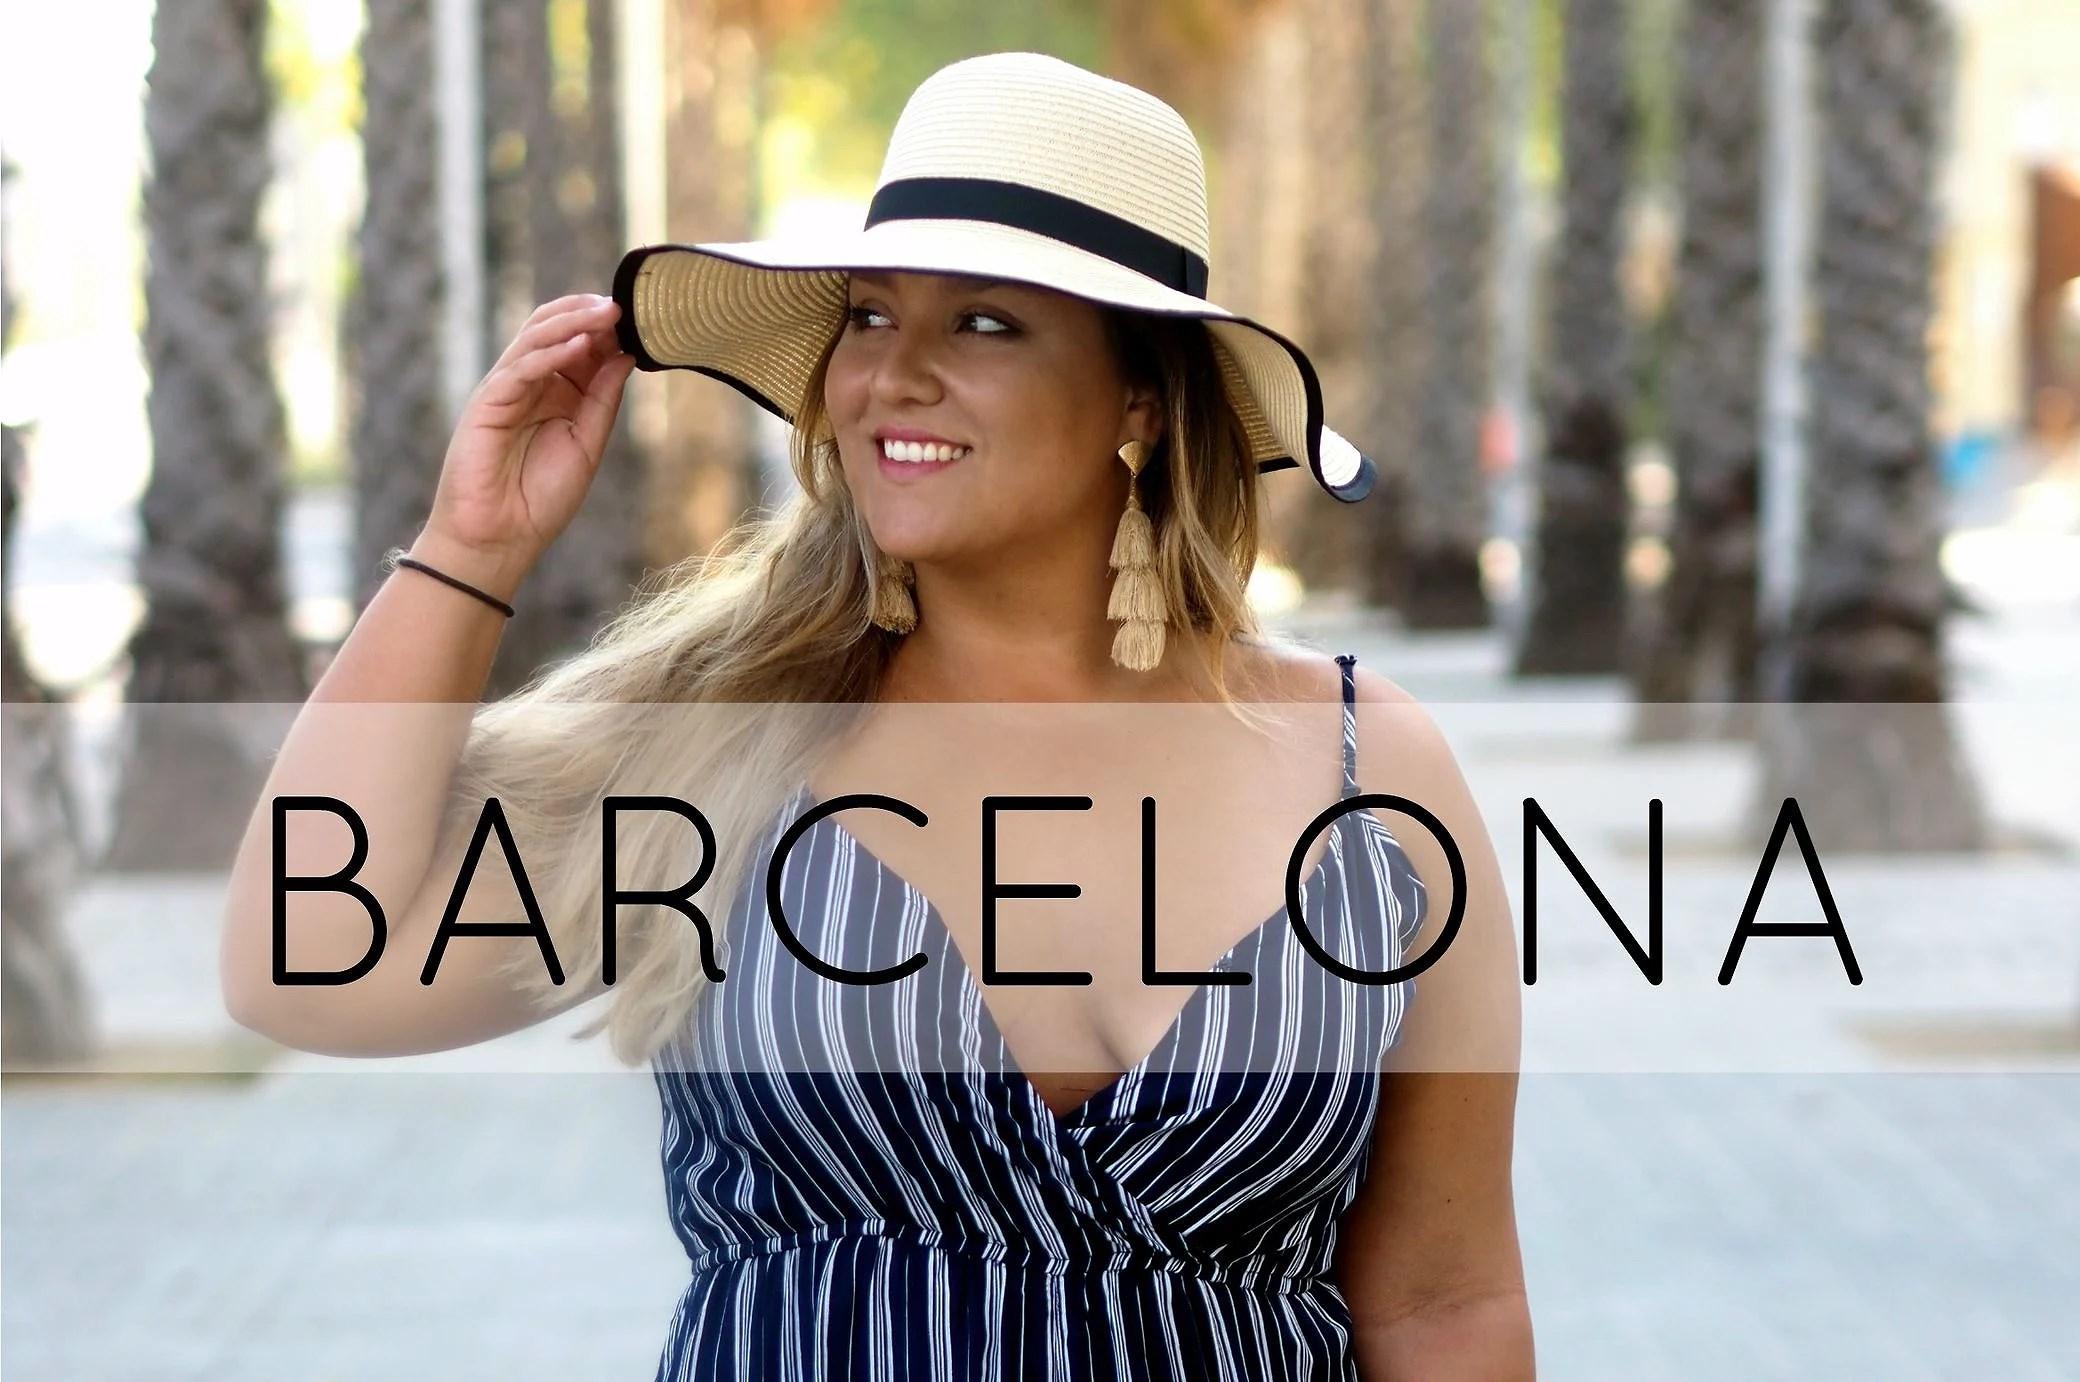 VIDEOBLOGG: BARCELONA